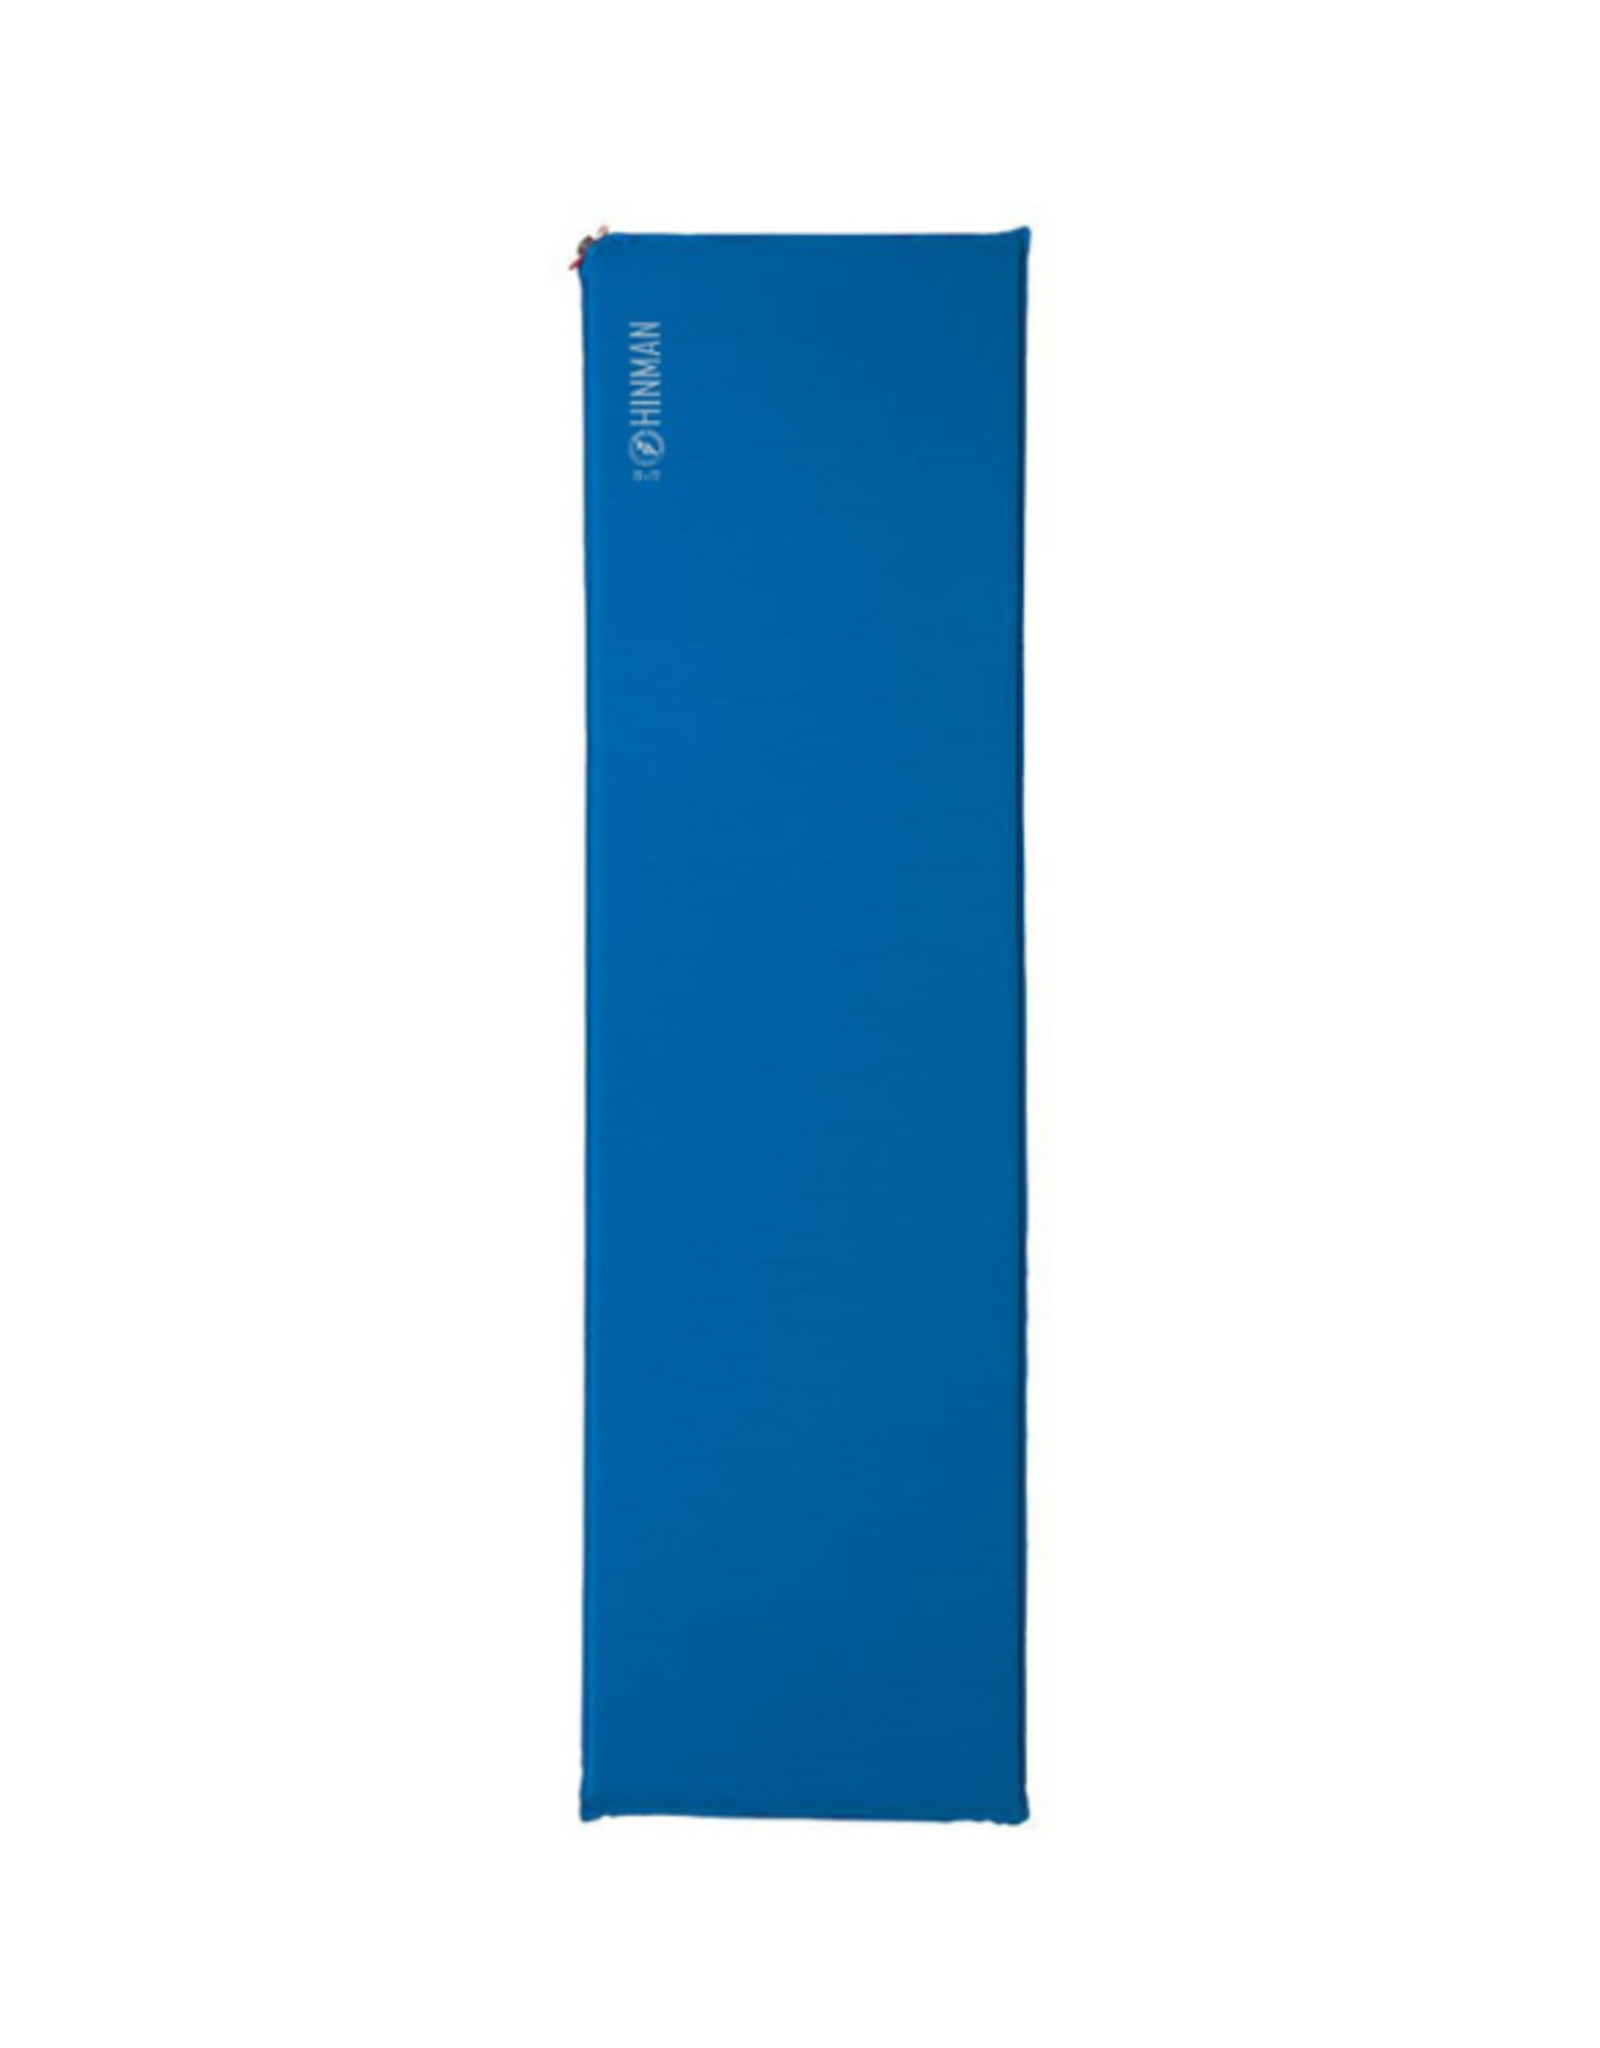 Big Agnes Hinman Sleeping Pad 20x72x1.5 Regular Blue